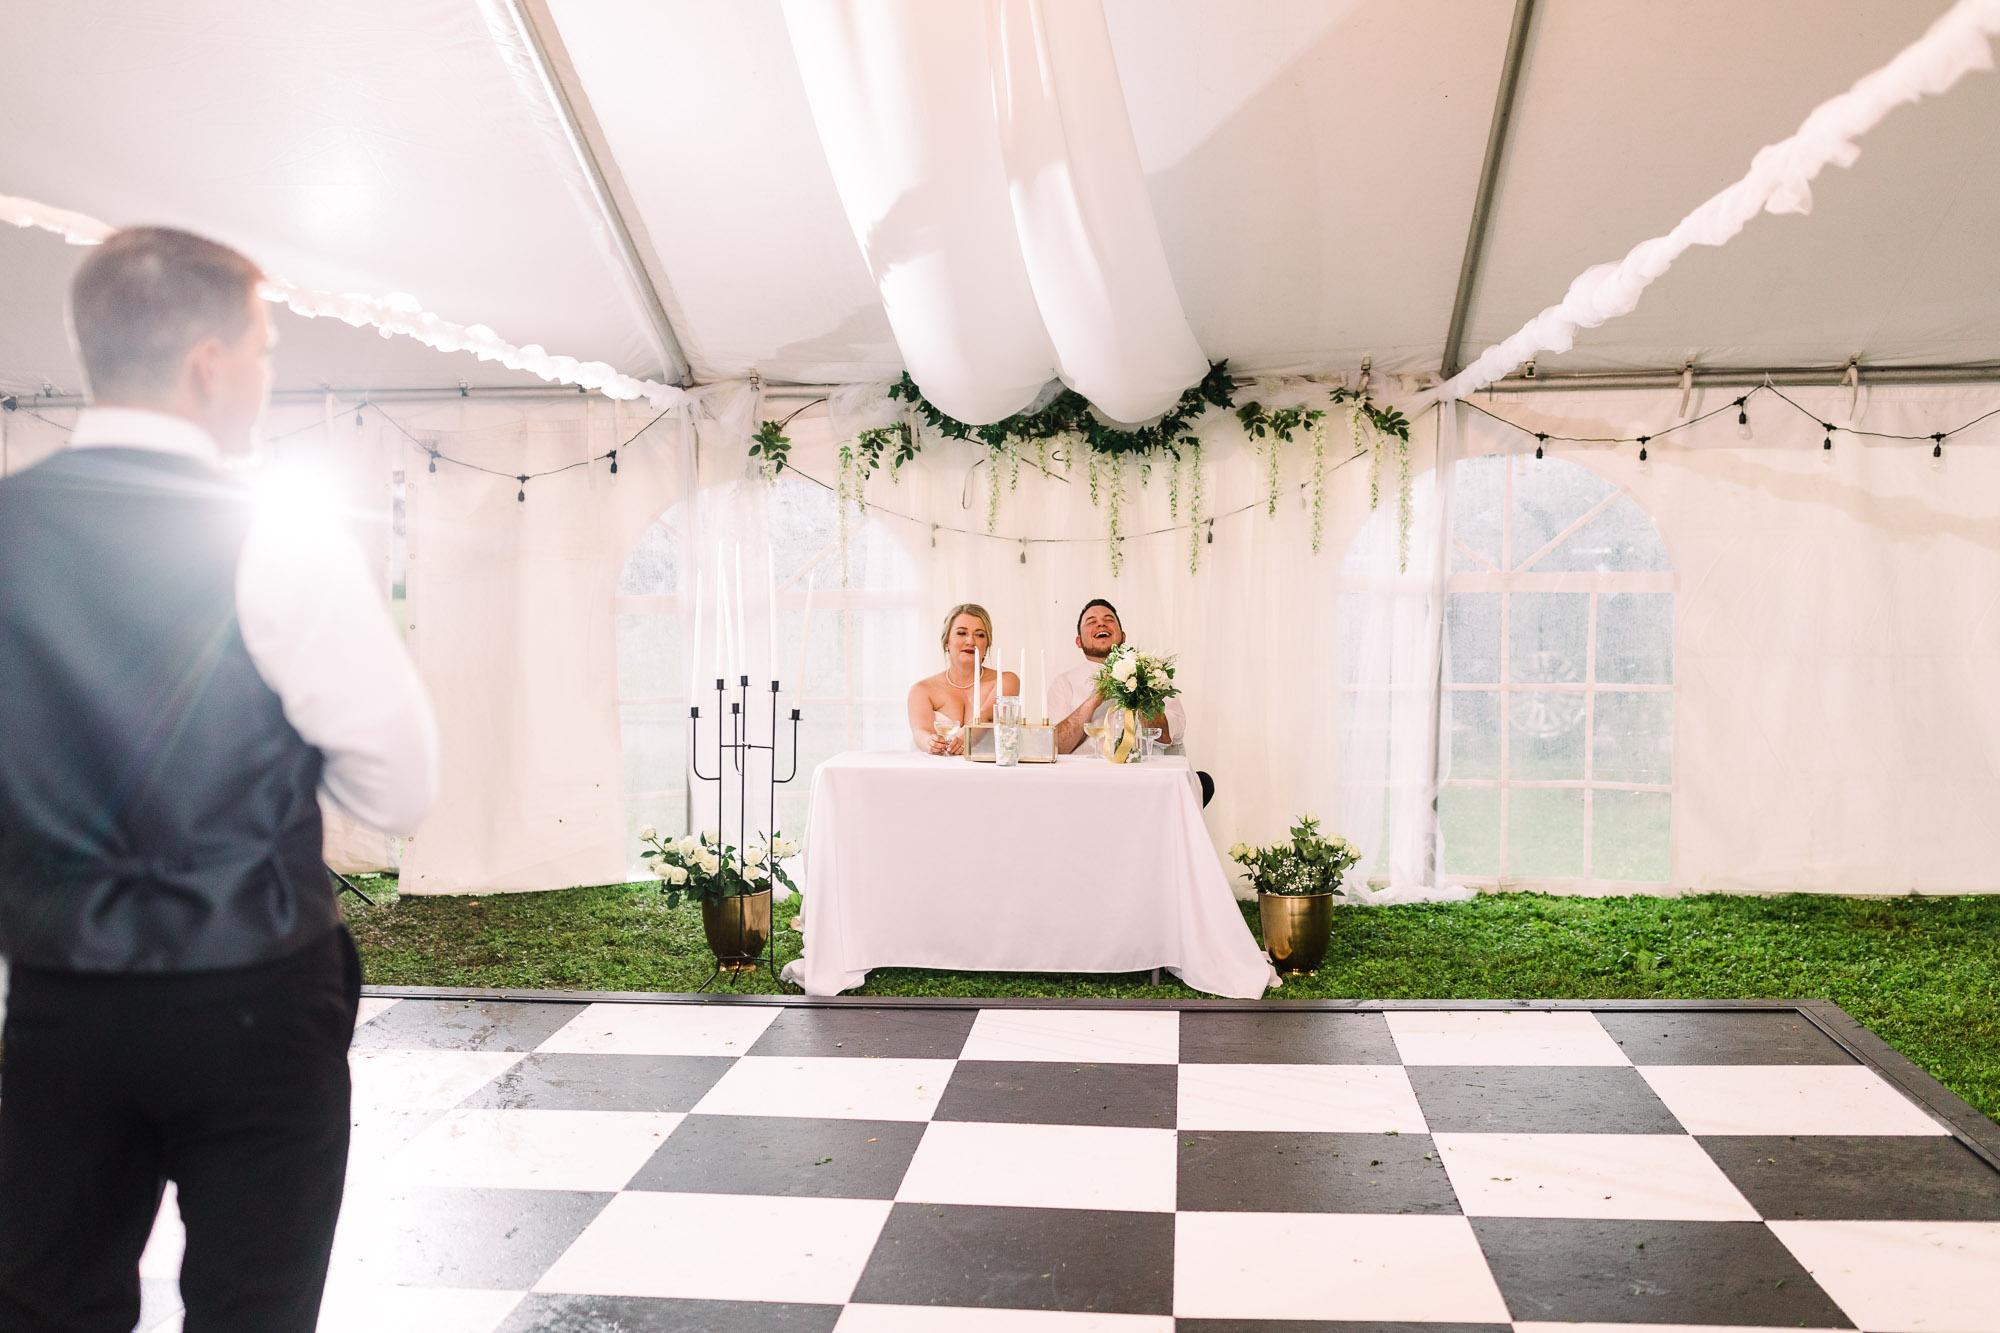 isle-of-que-wedding-7162.jpg